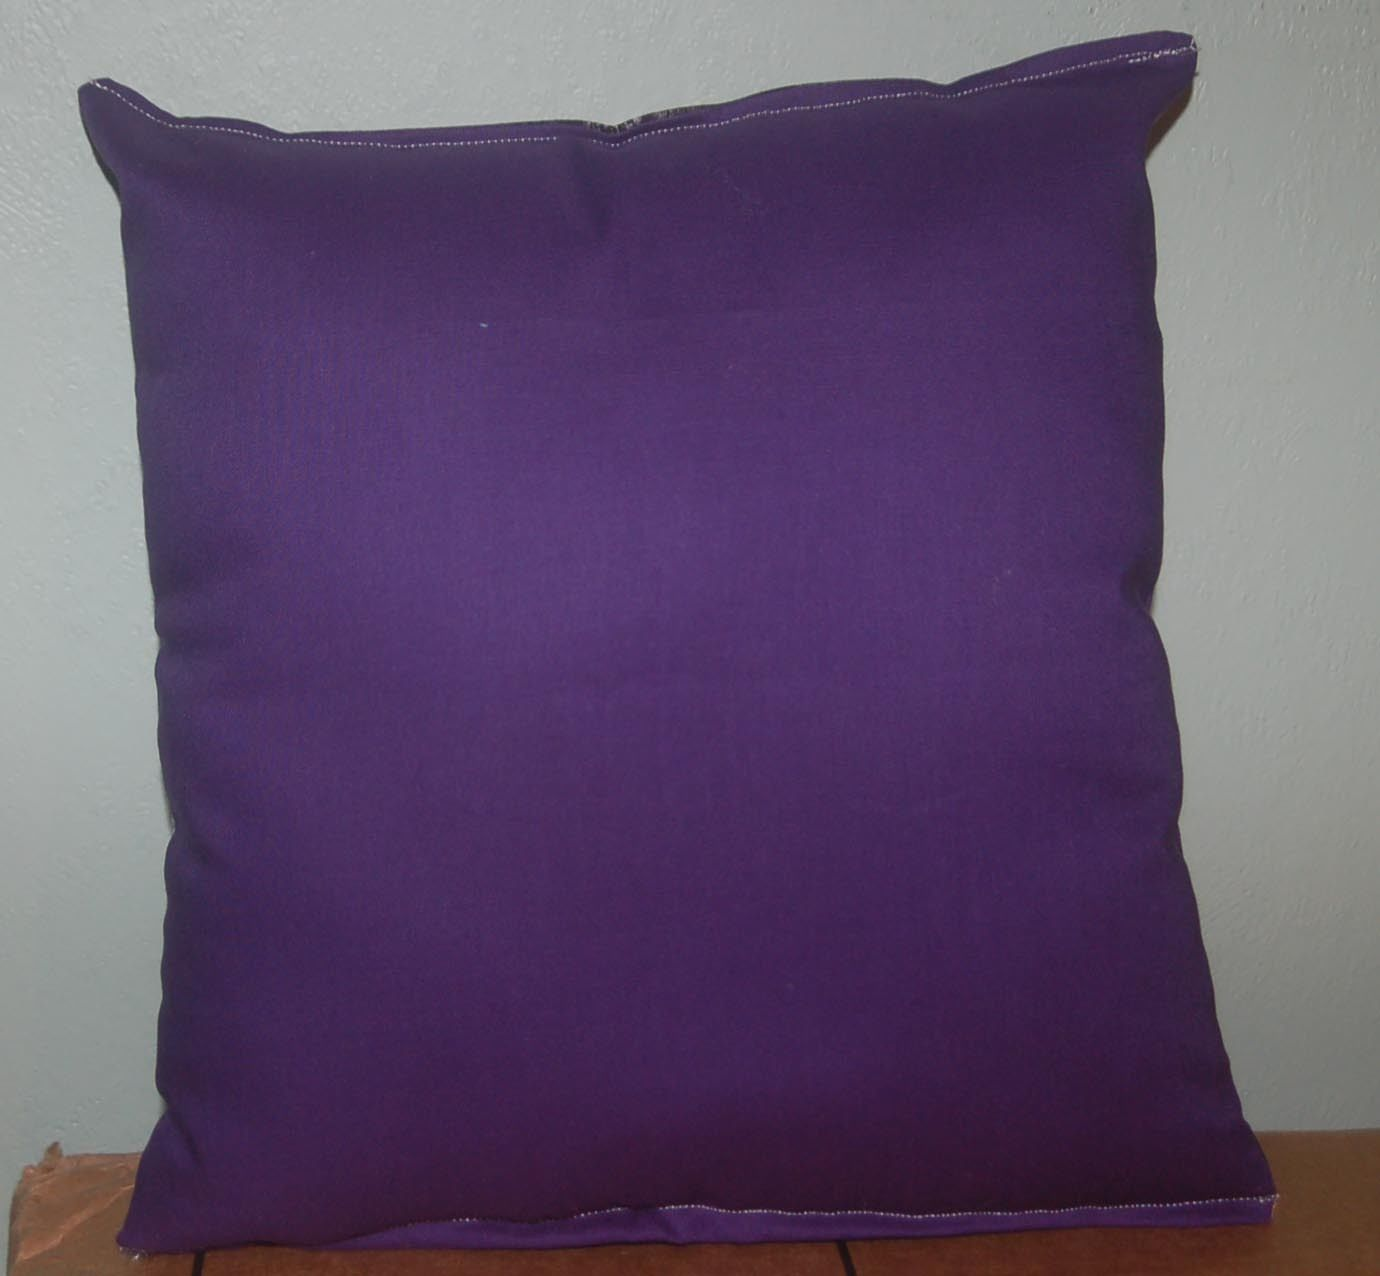 Lakers Pillow Los Angeles Lakers Pillow NBA LA Lakers Handmade in USA